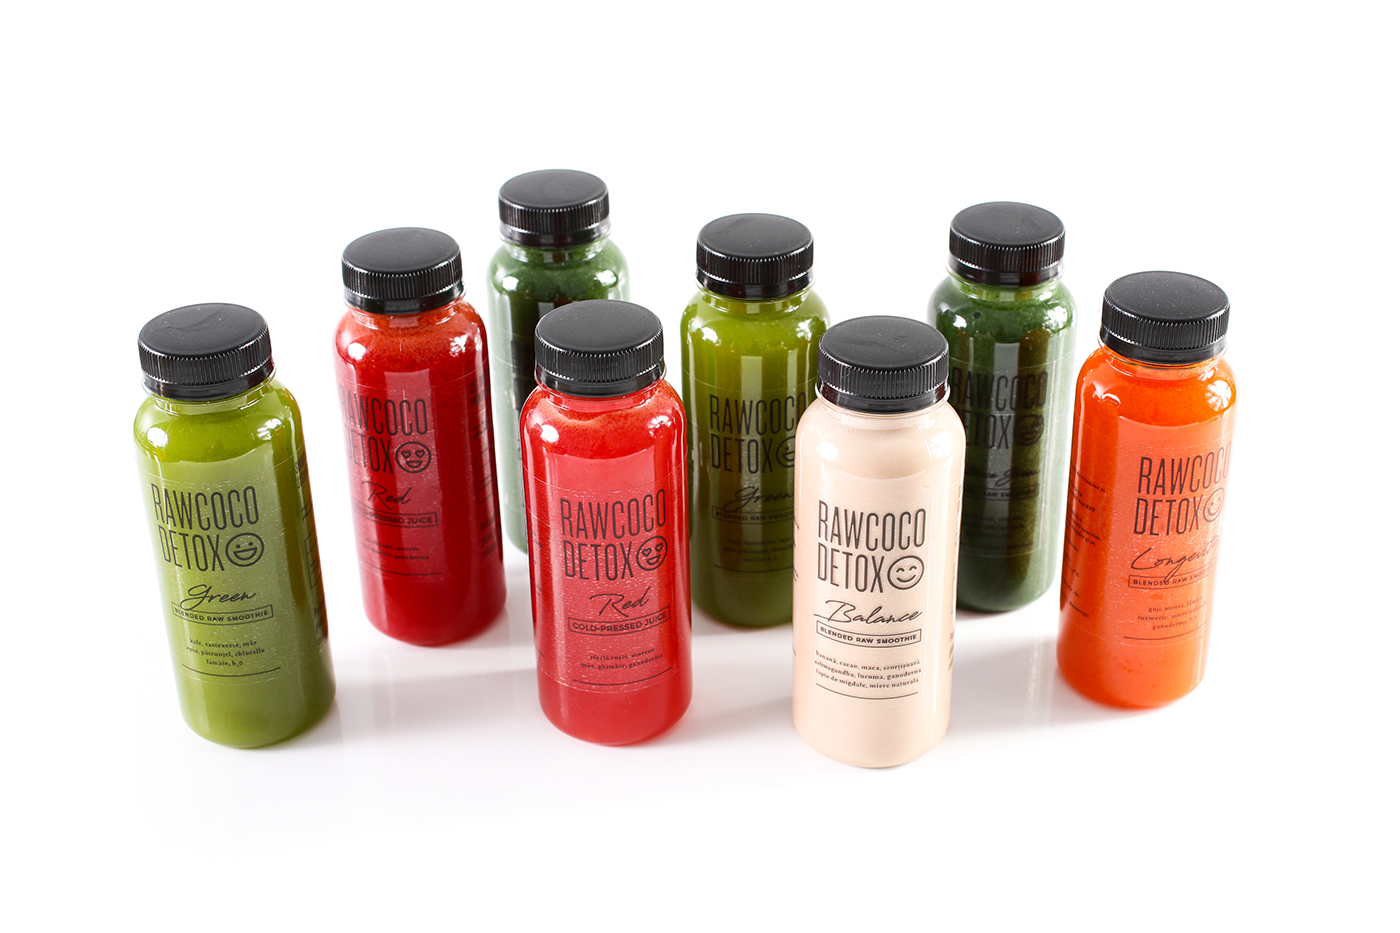 RawCoco bottle bottle design Packaging packaging design graphic design  minimalist juice Cristi Ursea Dsgnr Studio